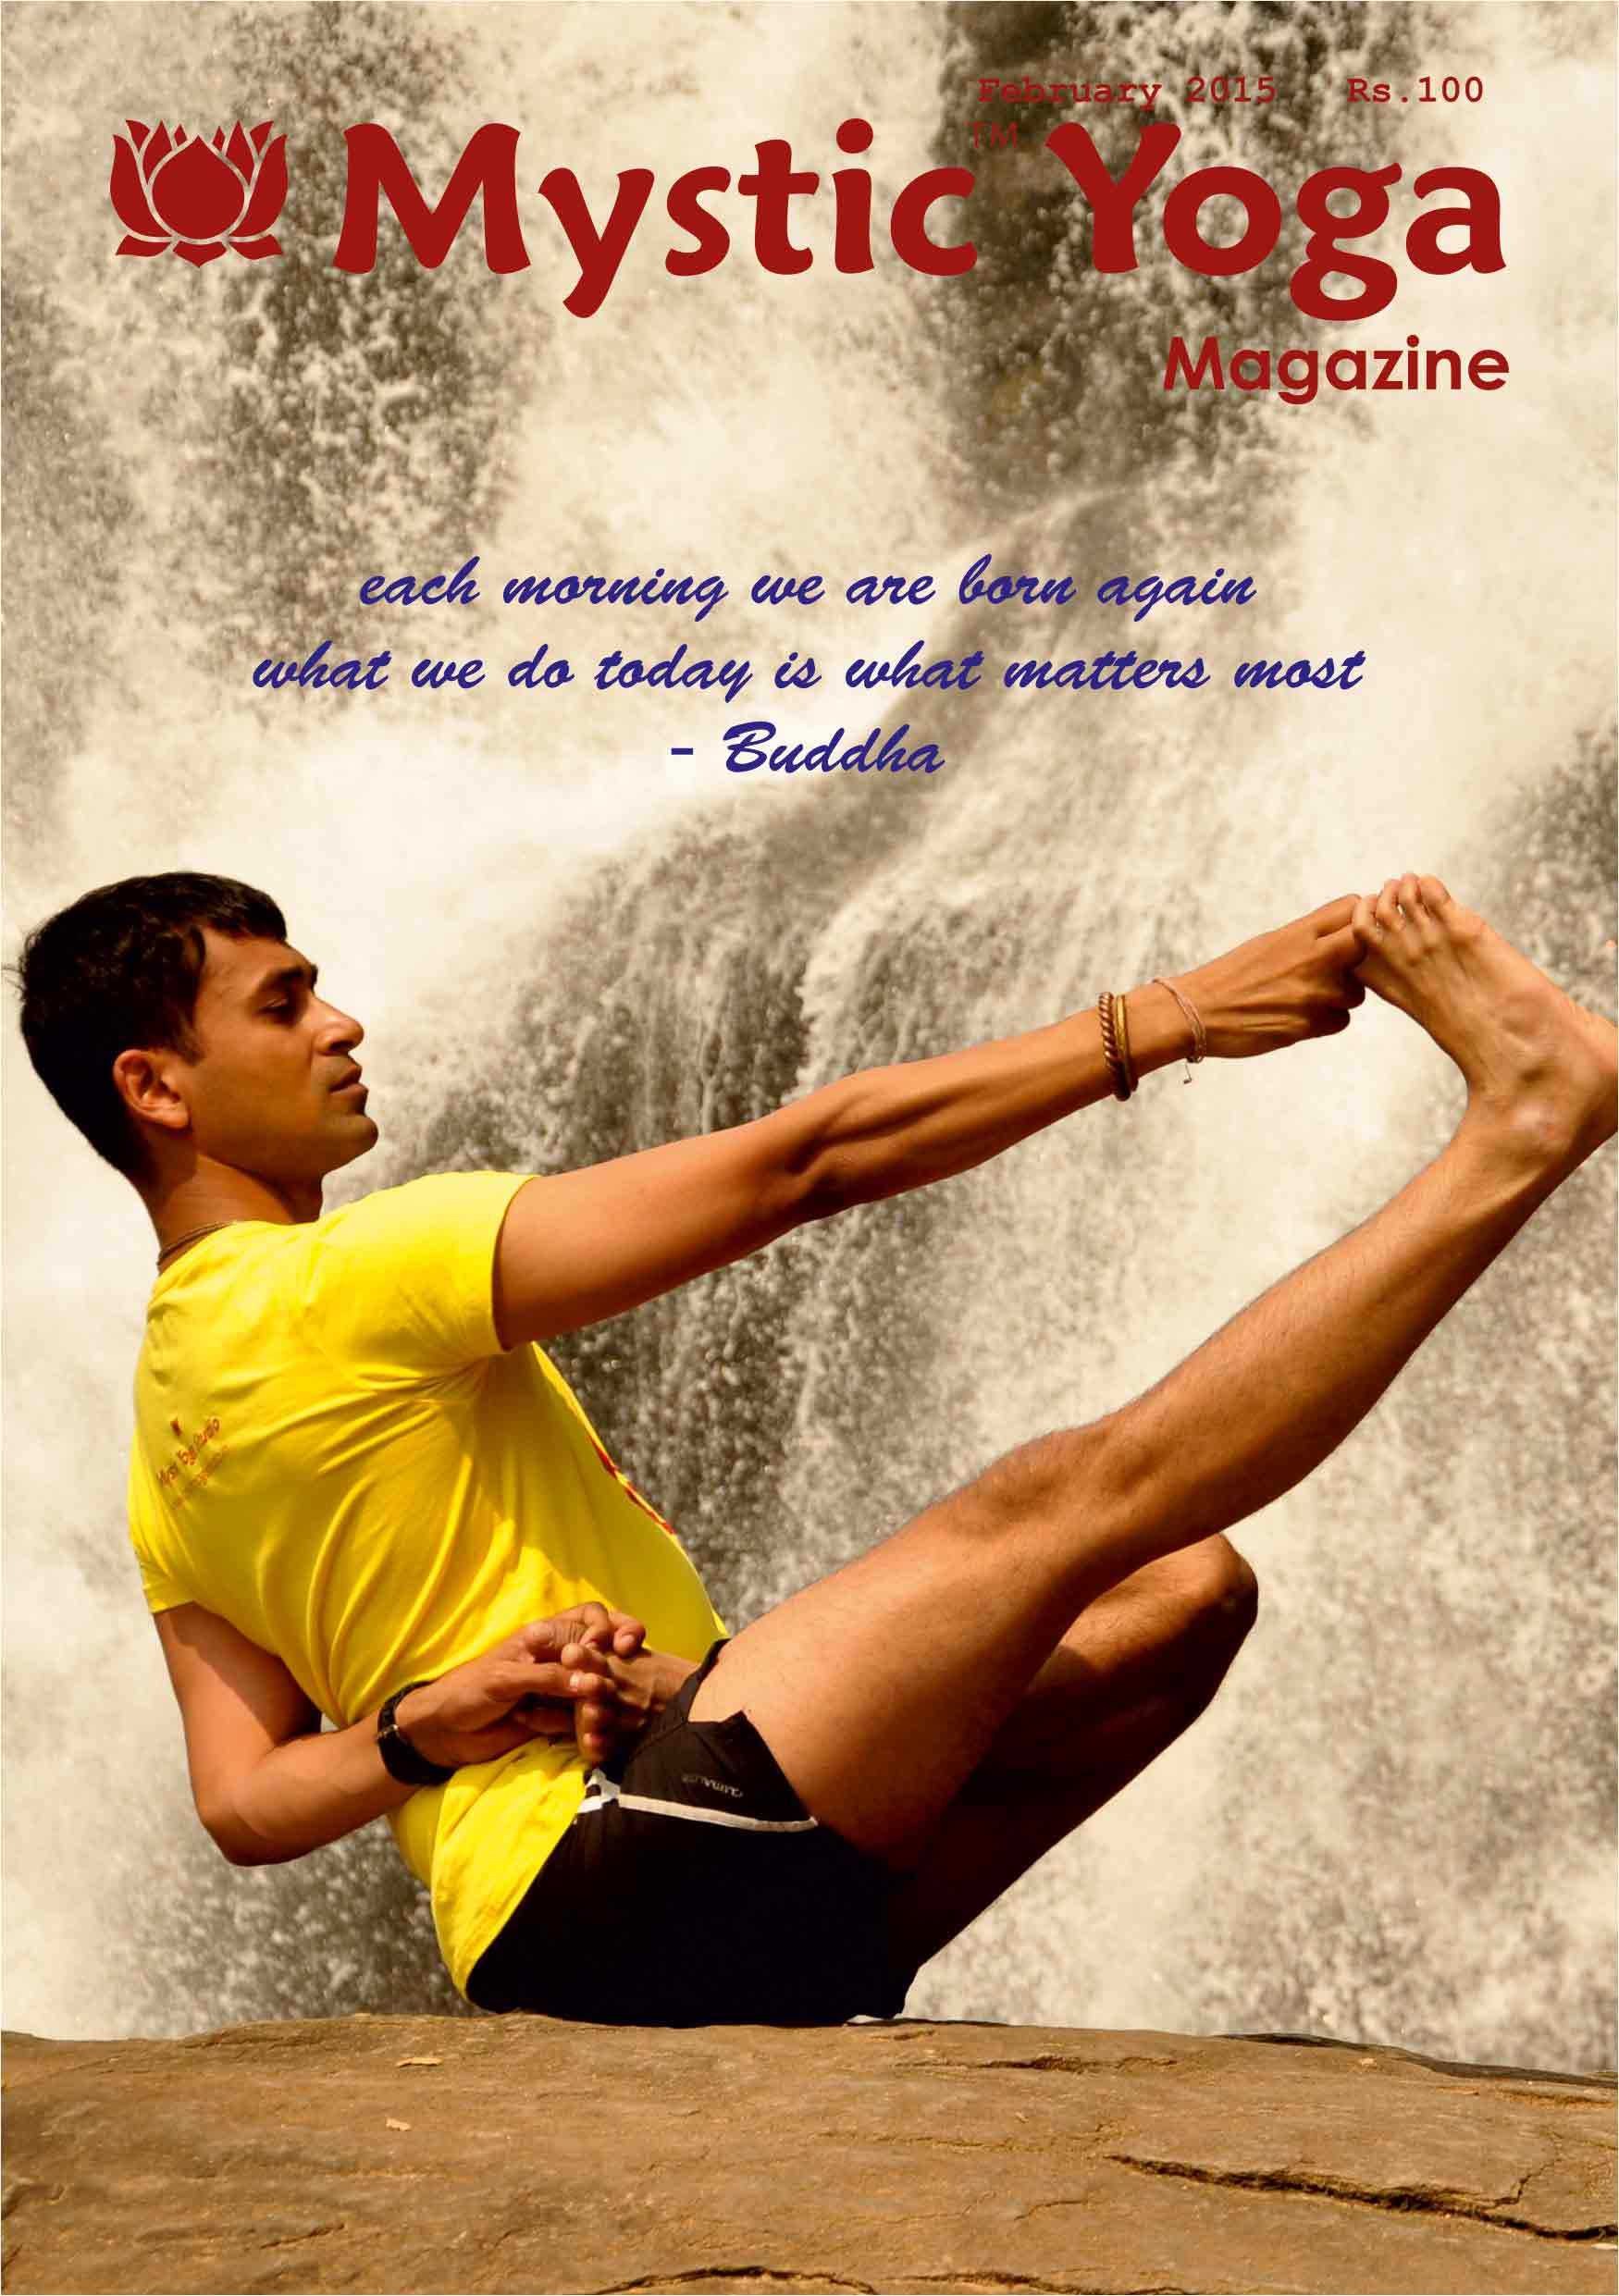 Mystic Yoga Magazine - February 2015